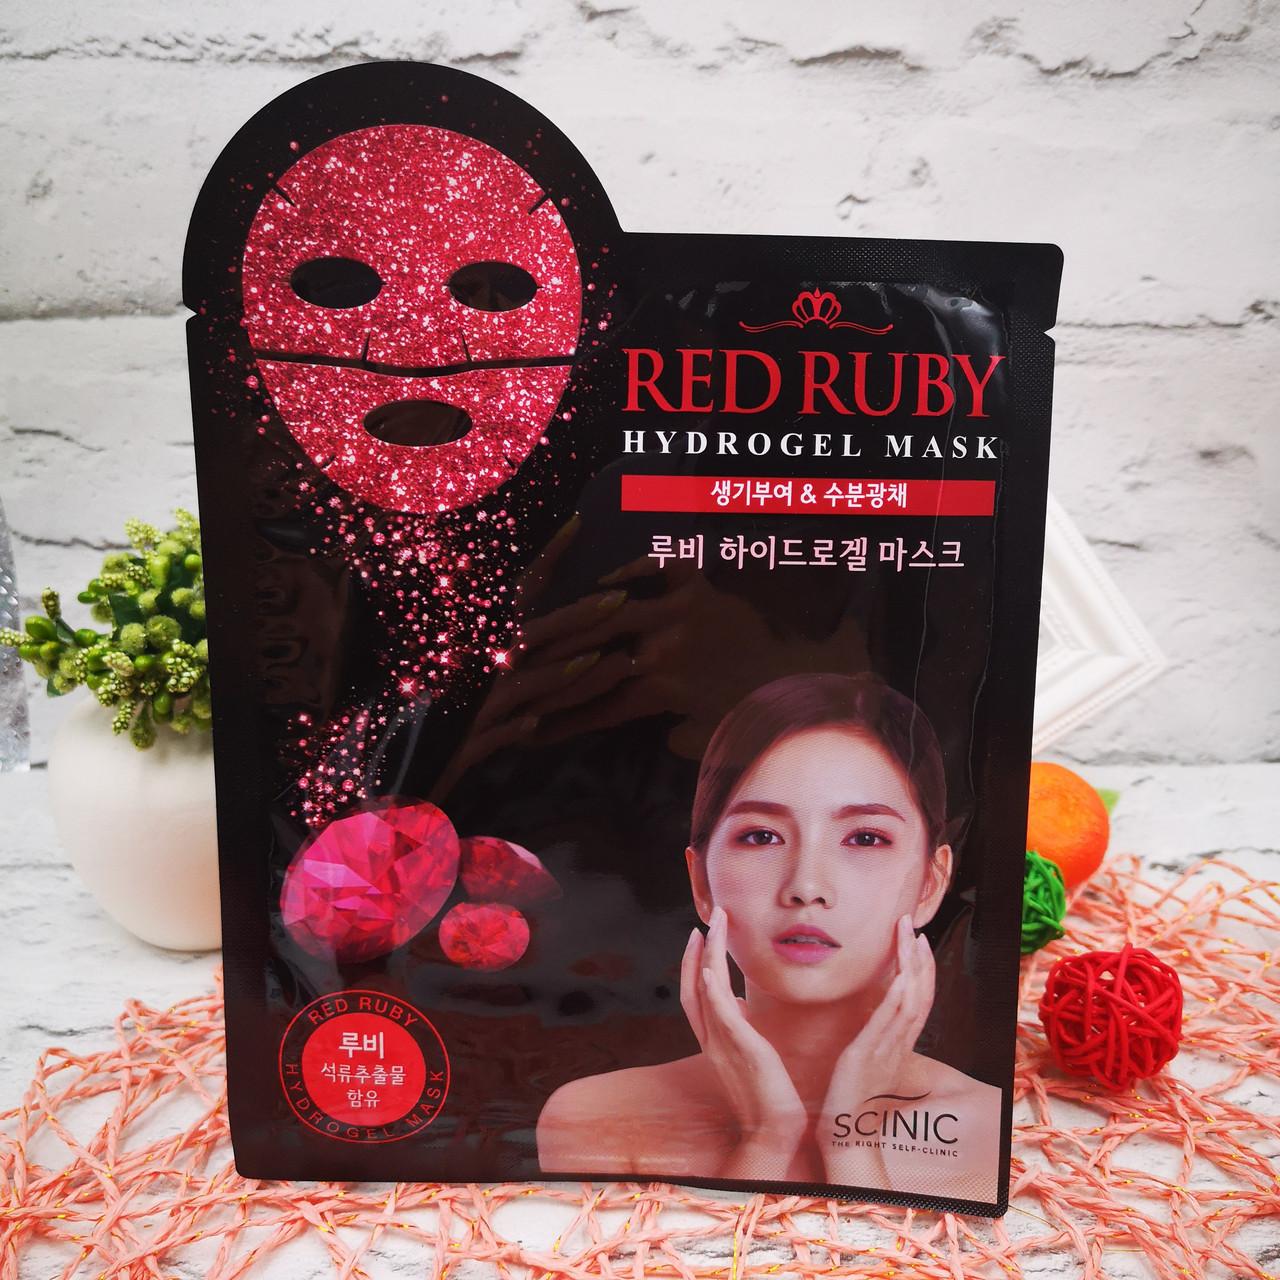 Гідрогелева маска для обличчя з частинками рубіна SCINIC Red Ruby Hydrogel Mask